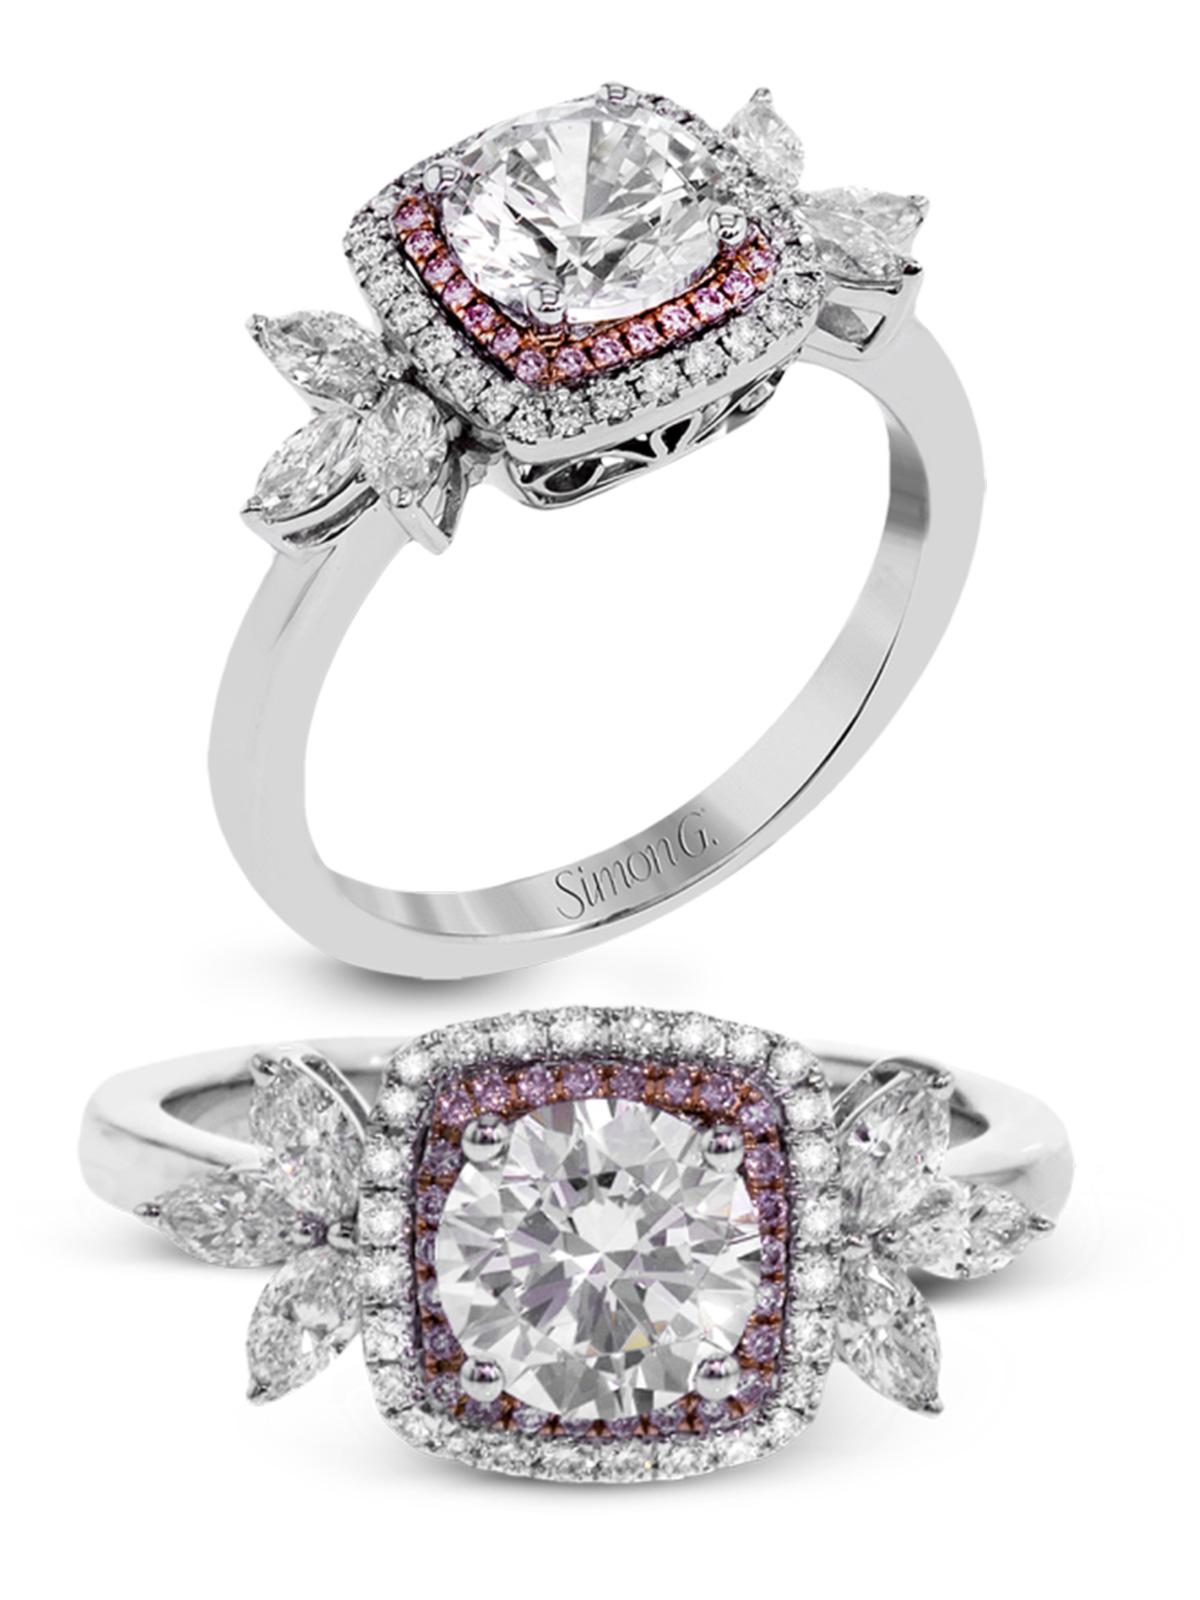 simon g jewelry 2017 trends diamond engagement ring mr2826 white gold rose gold pink diamonds halo ring